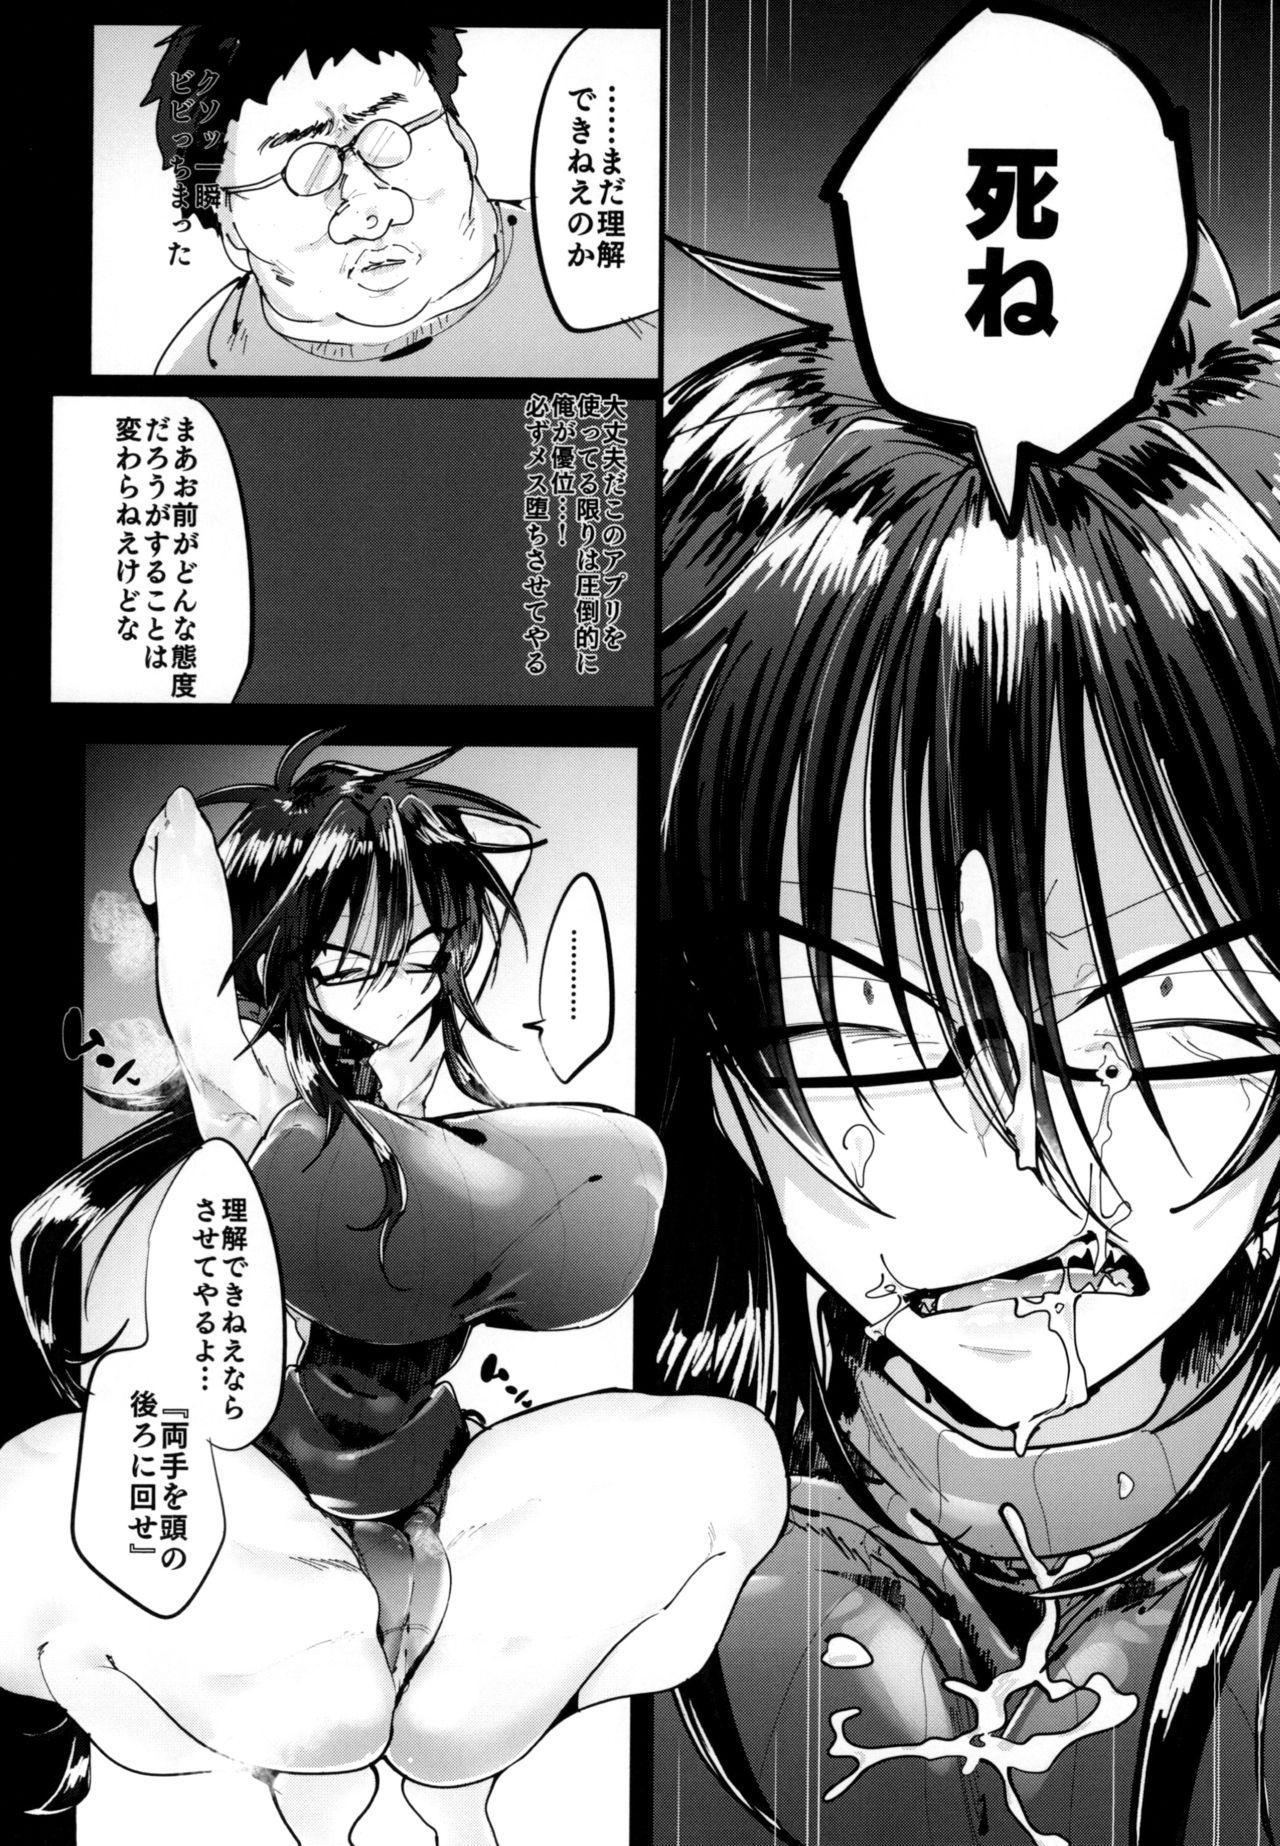 Kurokami Sanpakugan Megane Danshi TS Kyousei Fukujuu Fuck 9